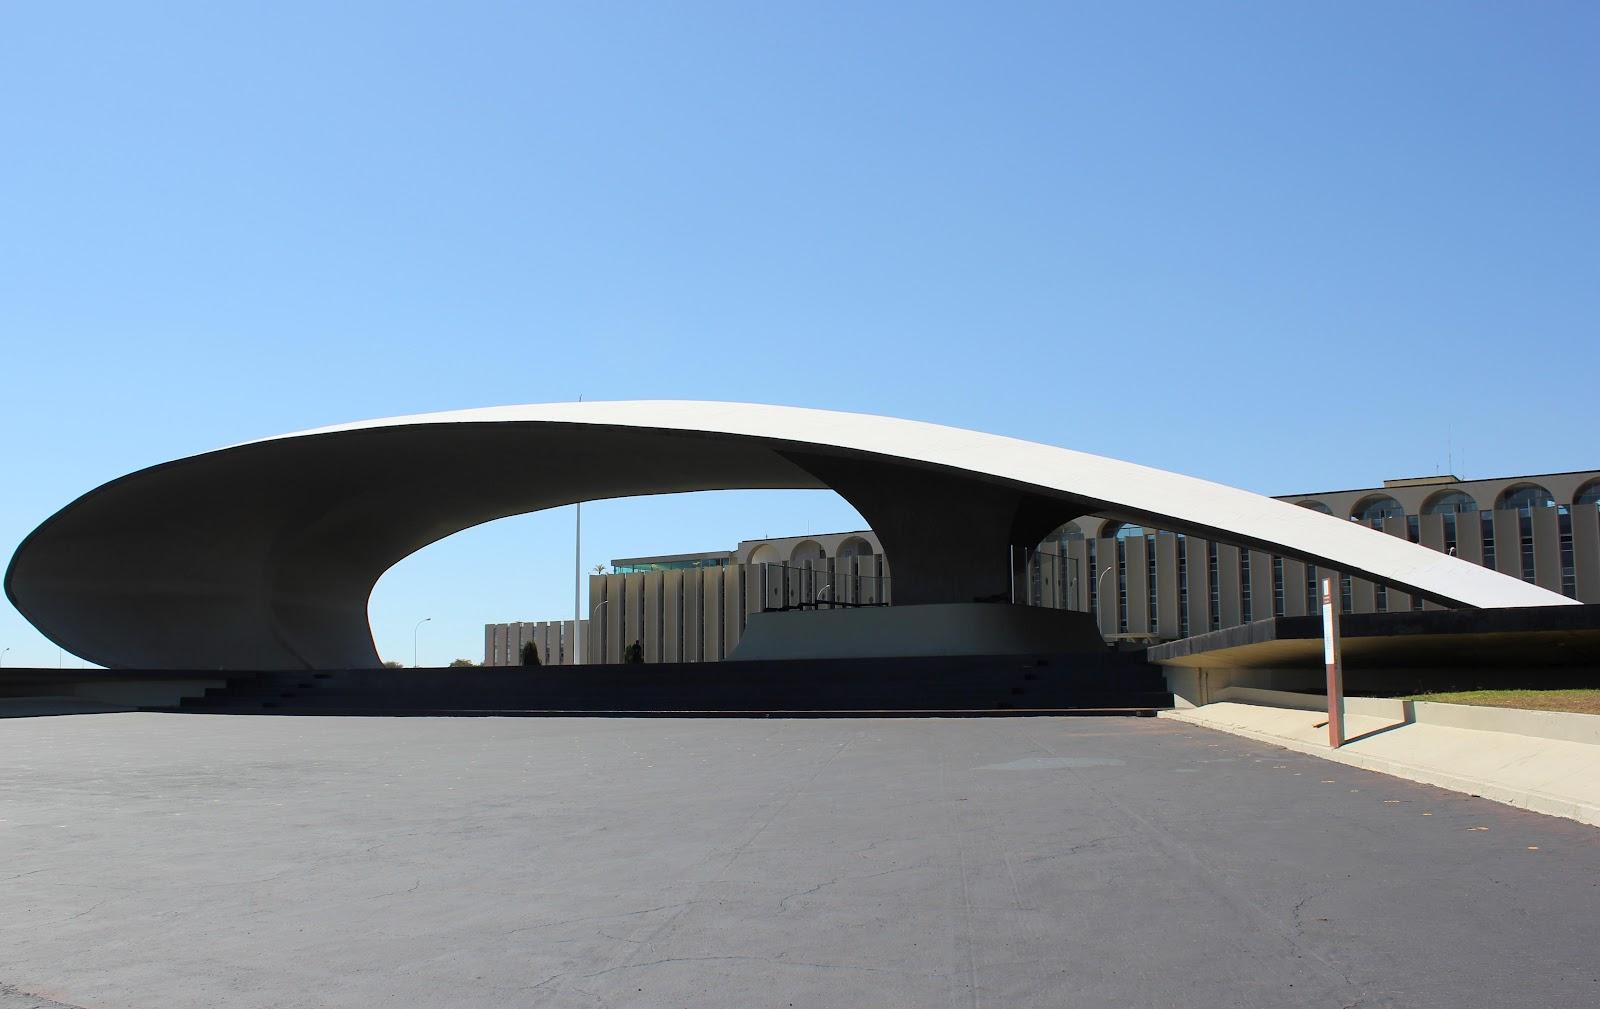 2014 04 01 archive besides Edificio besides Oscar Ribeiro De Almeida Niemeyer Soares Filho also Info Aquafun Park Clarens Casteljaloux 26648 further Amazing Modern Architectures. on oscar niemeyer structures